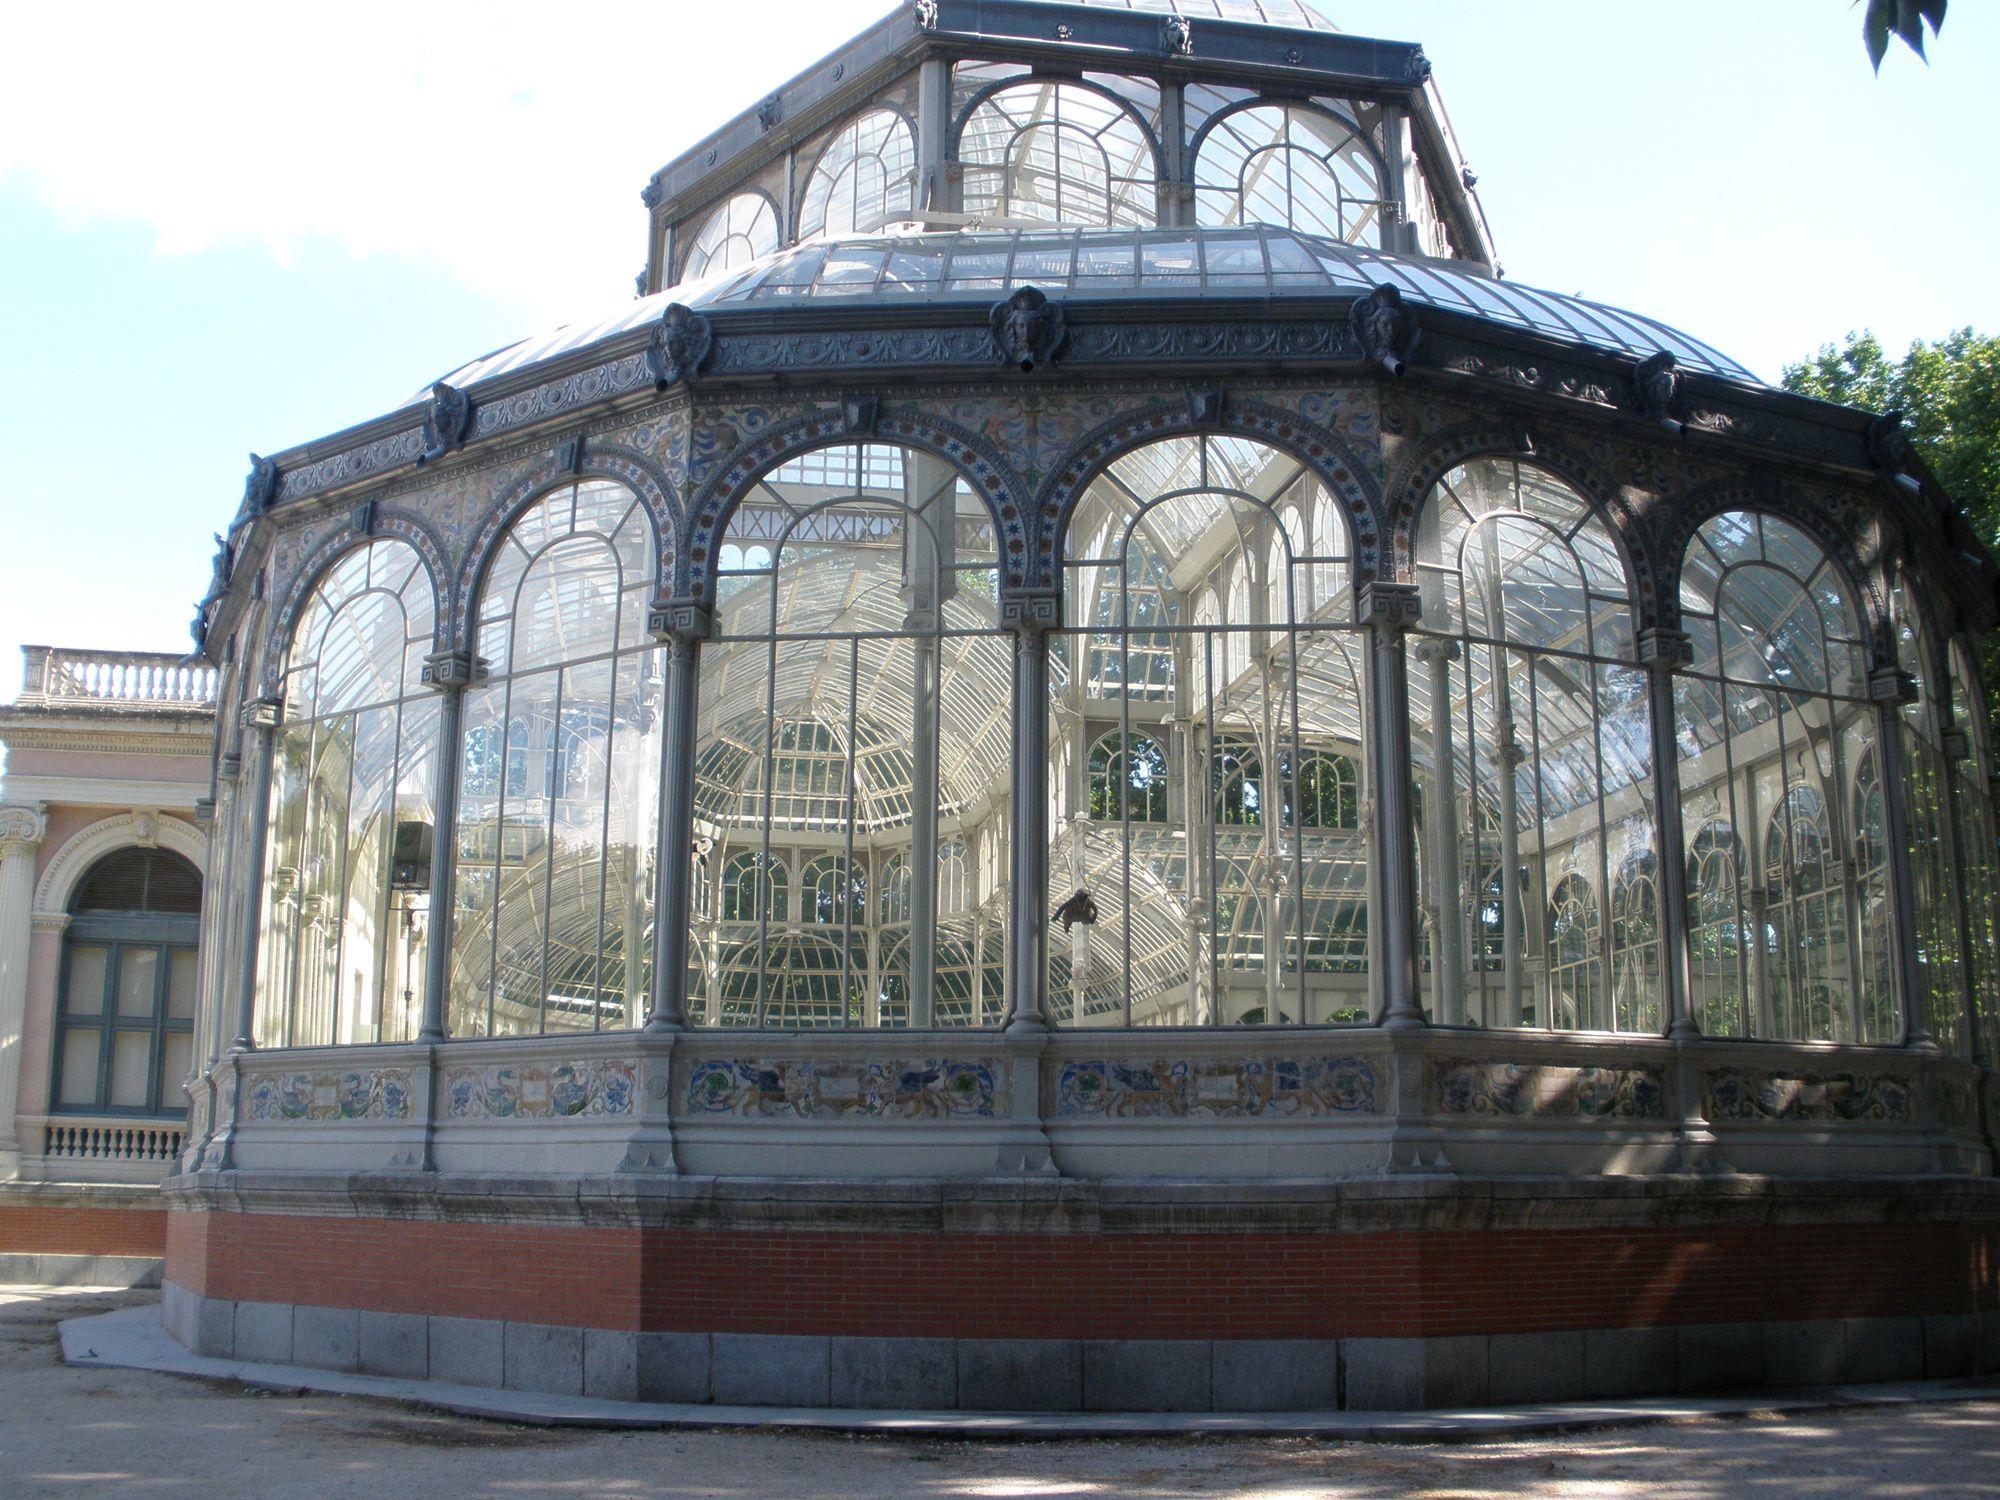 File:Palacio de Cristal Madrid 2009 05 24.jpg - Wikimedia Commons